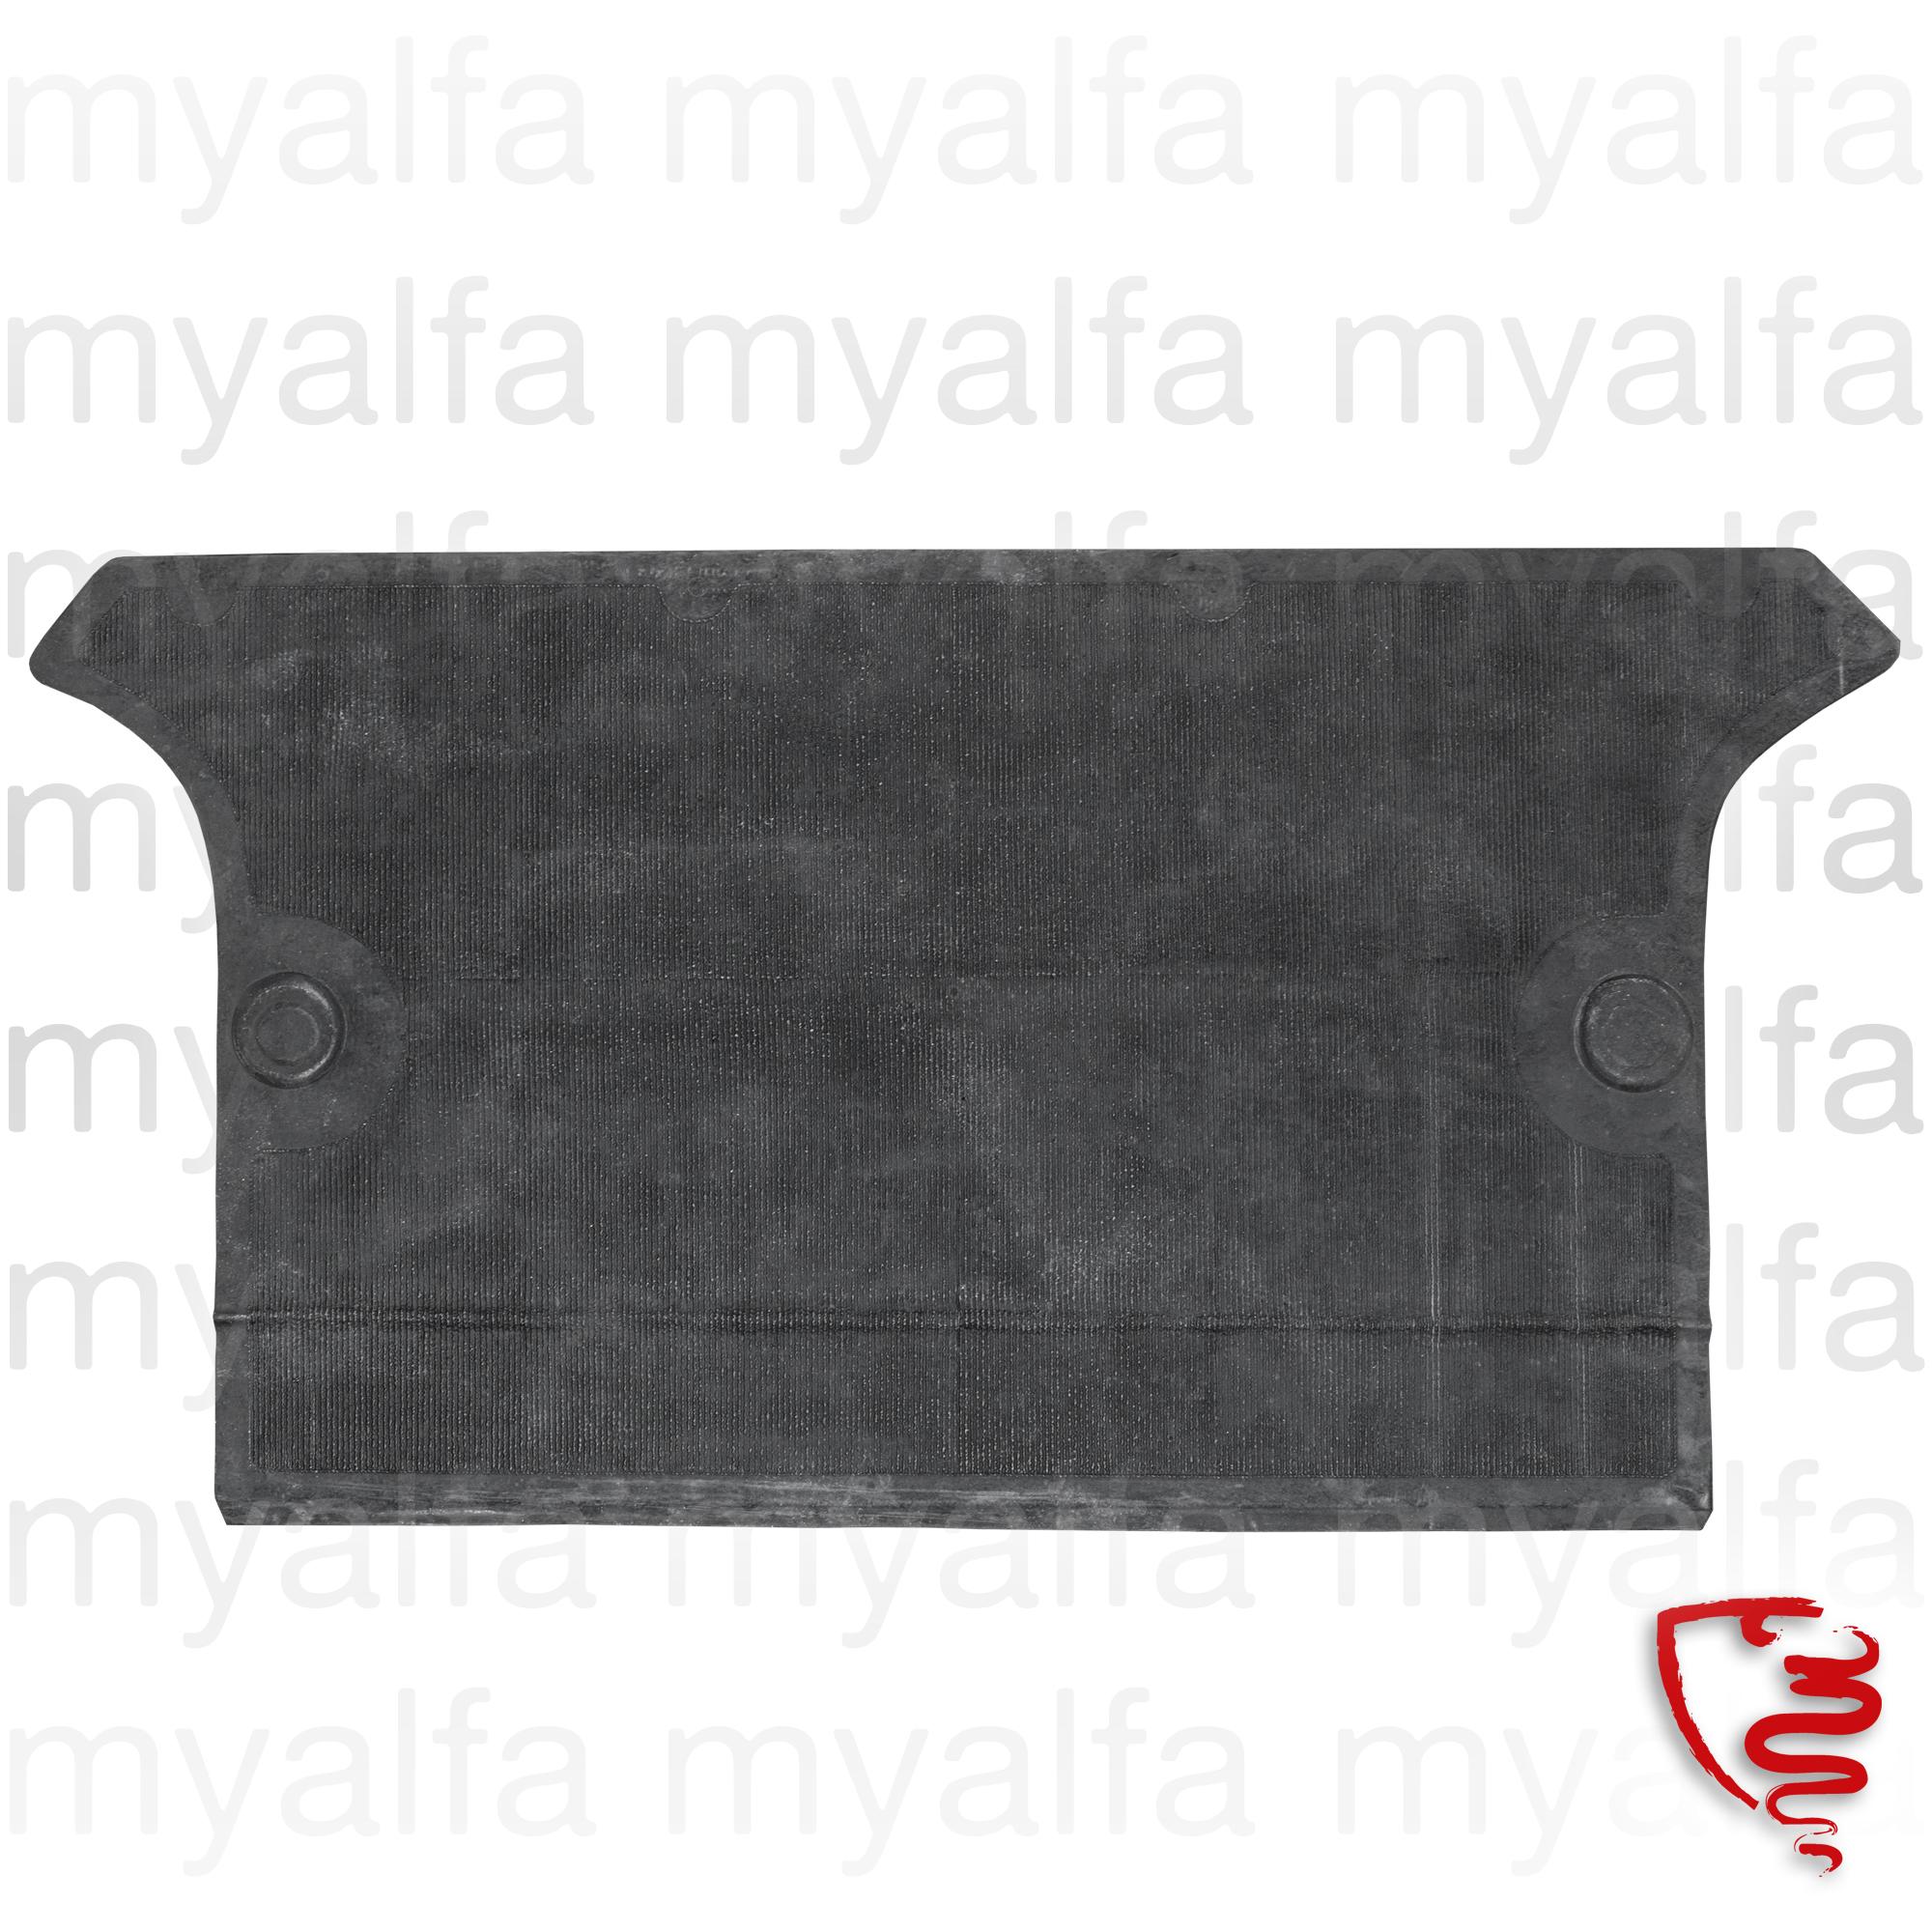 Rubber mat front bag panel - Giulia / GT Bertone for 105/115, Giulia, Coupe, Interior, Flooring, Rubber mats